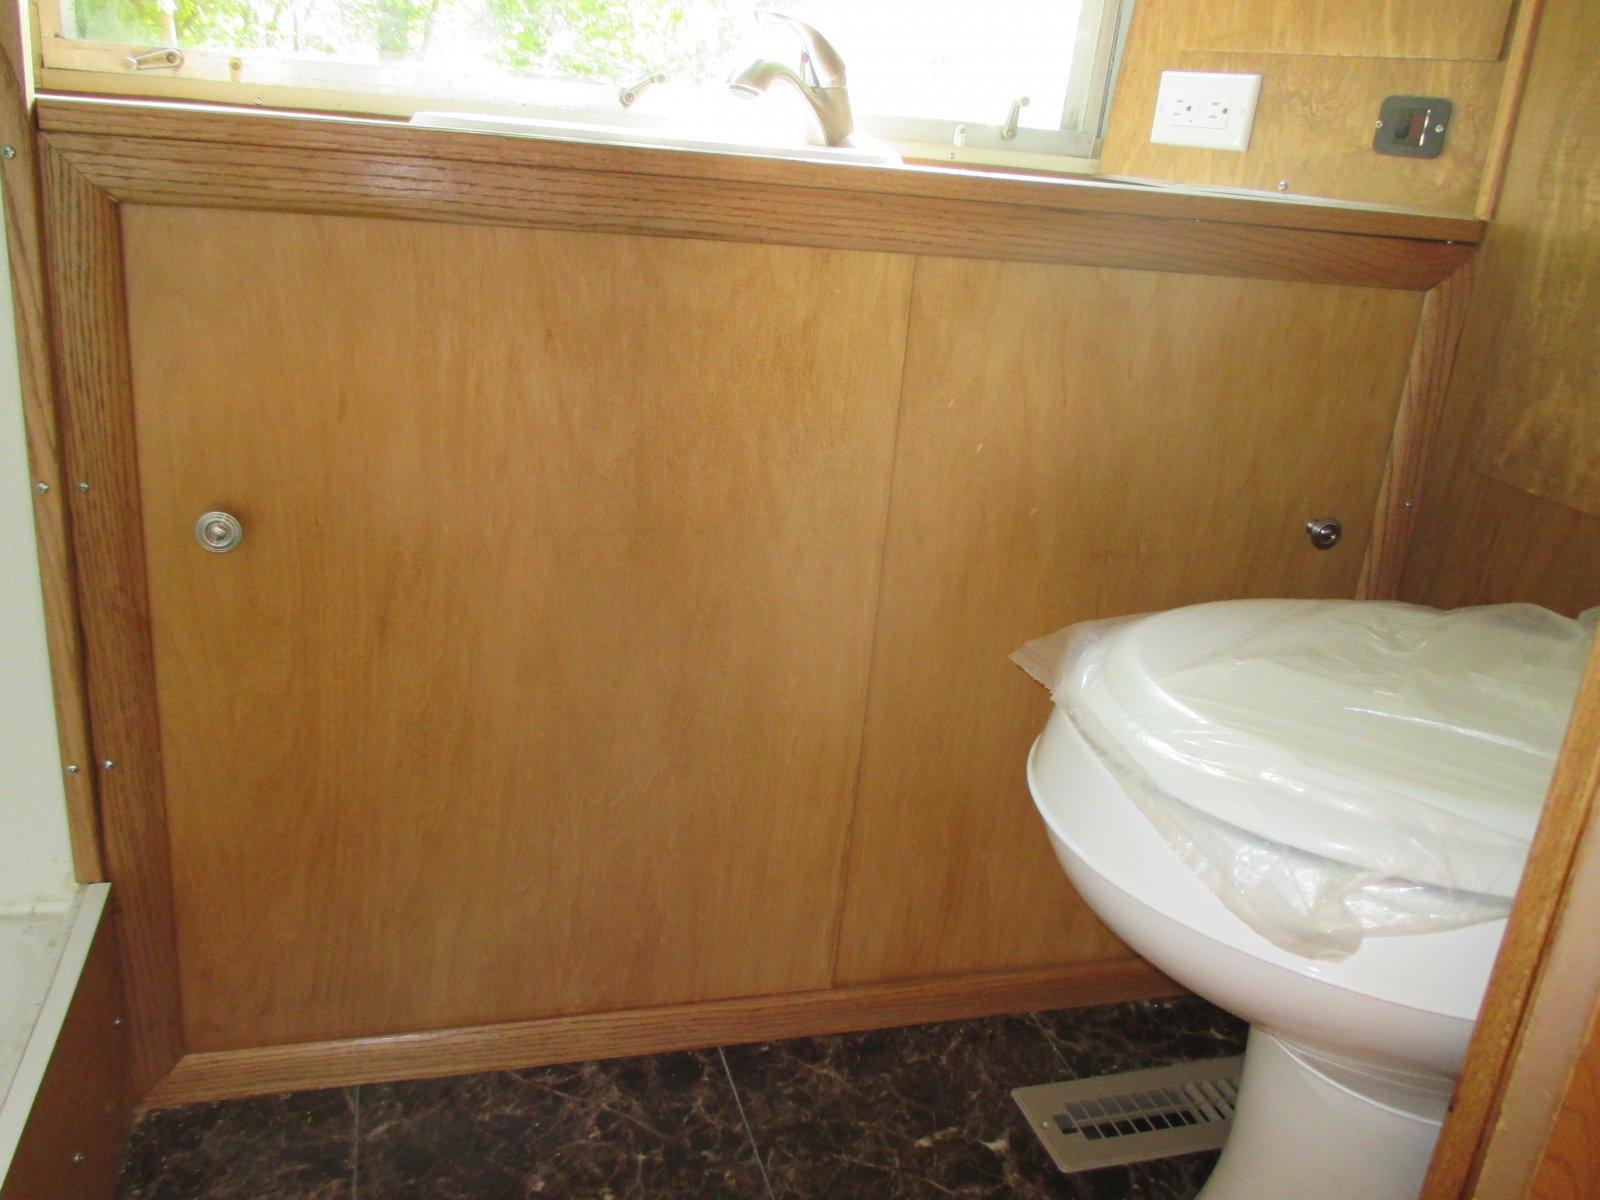 Click image for larger version  Name:1408 Bath Vanity Sliding Doors.jpg Views:153 Size:220.4 KB ID:242061